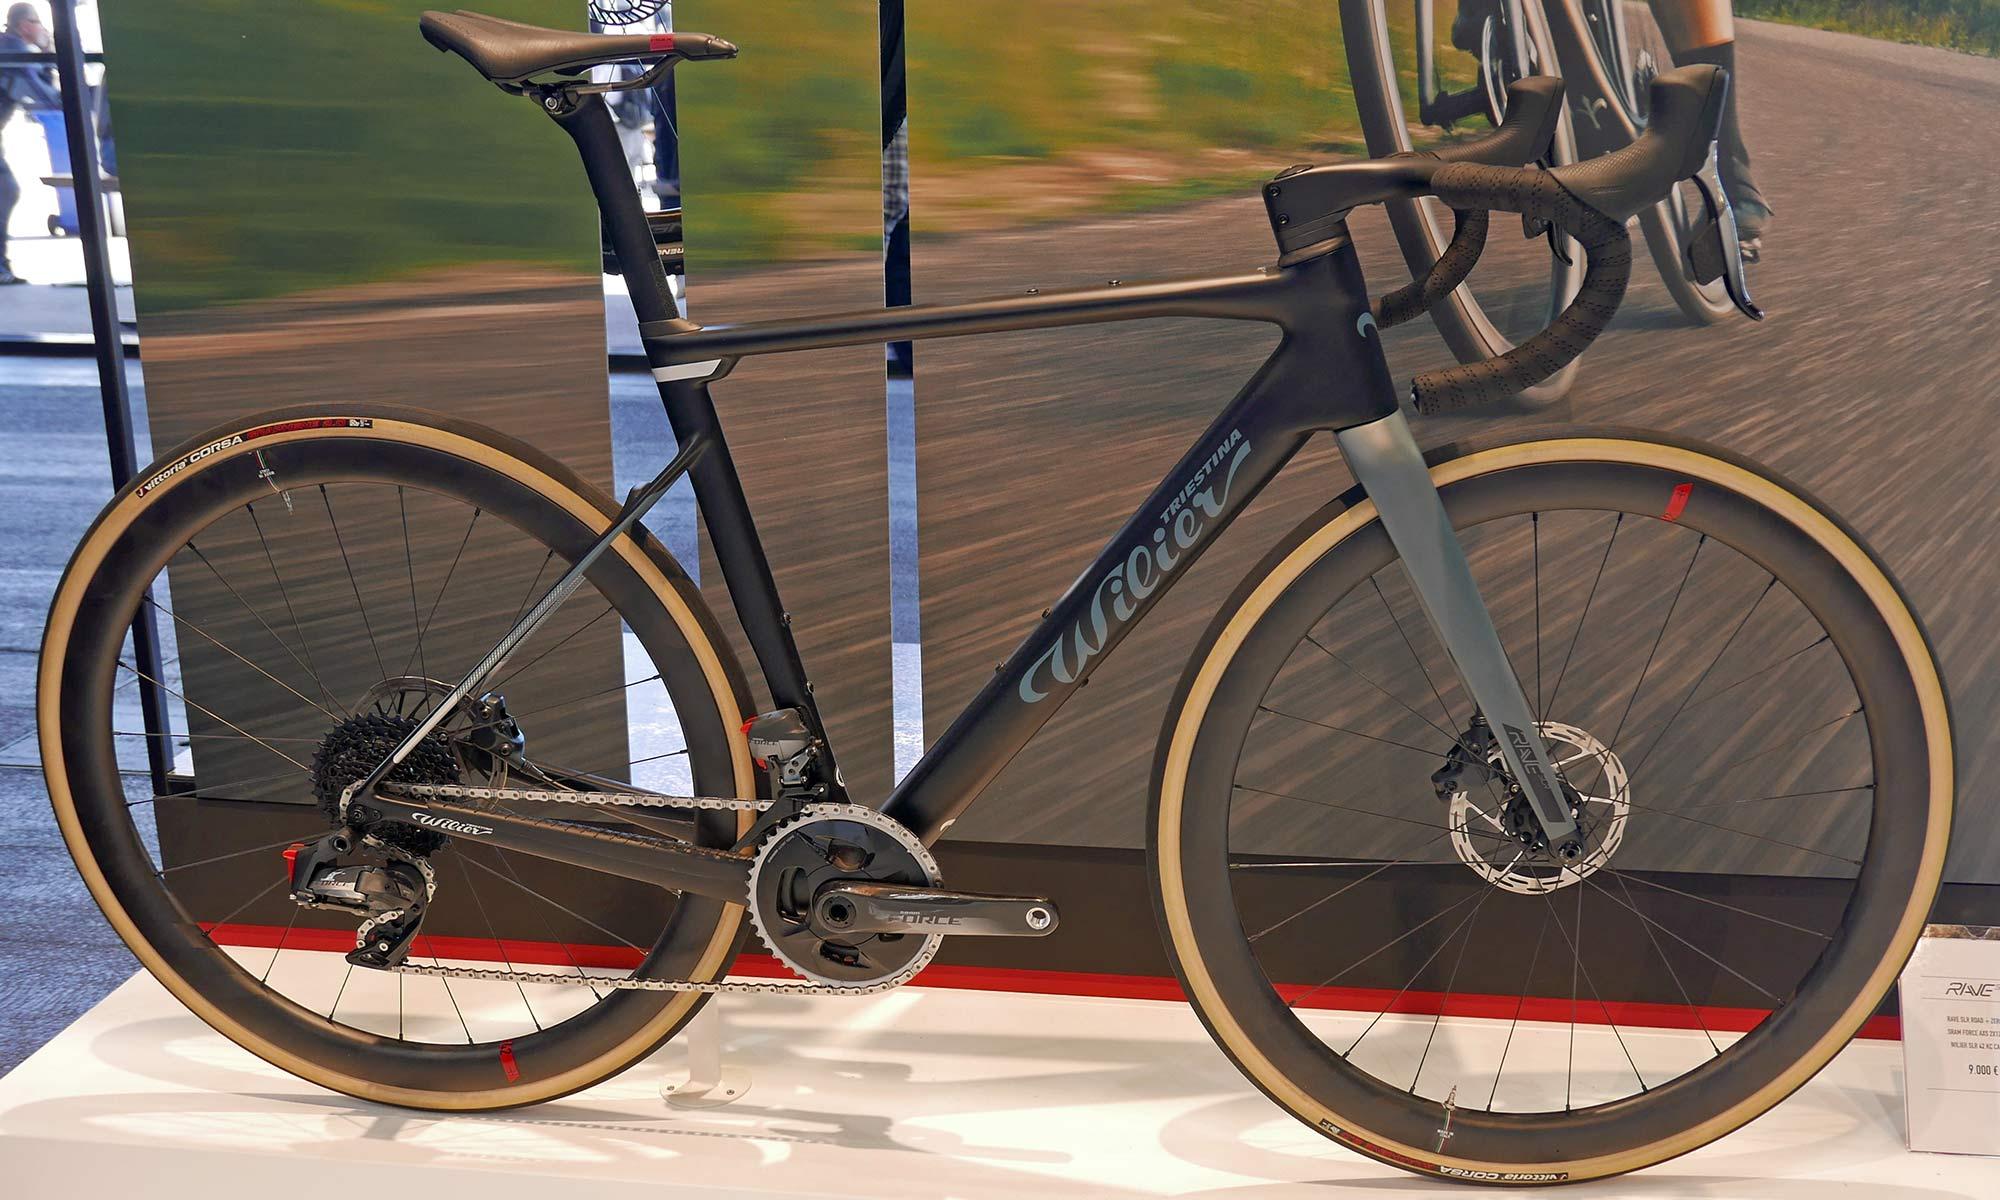 Wilier Rave SLR lightweight carbon all-road gravel bike, endurance all-road build